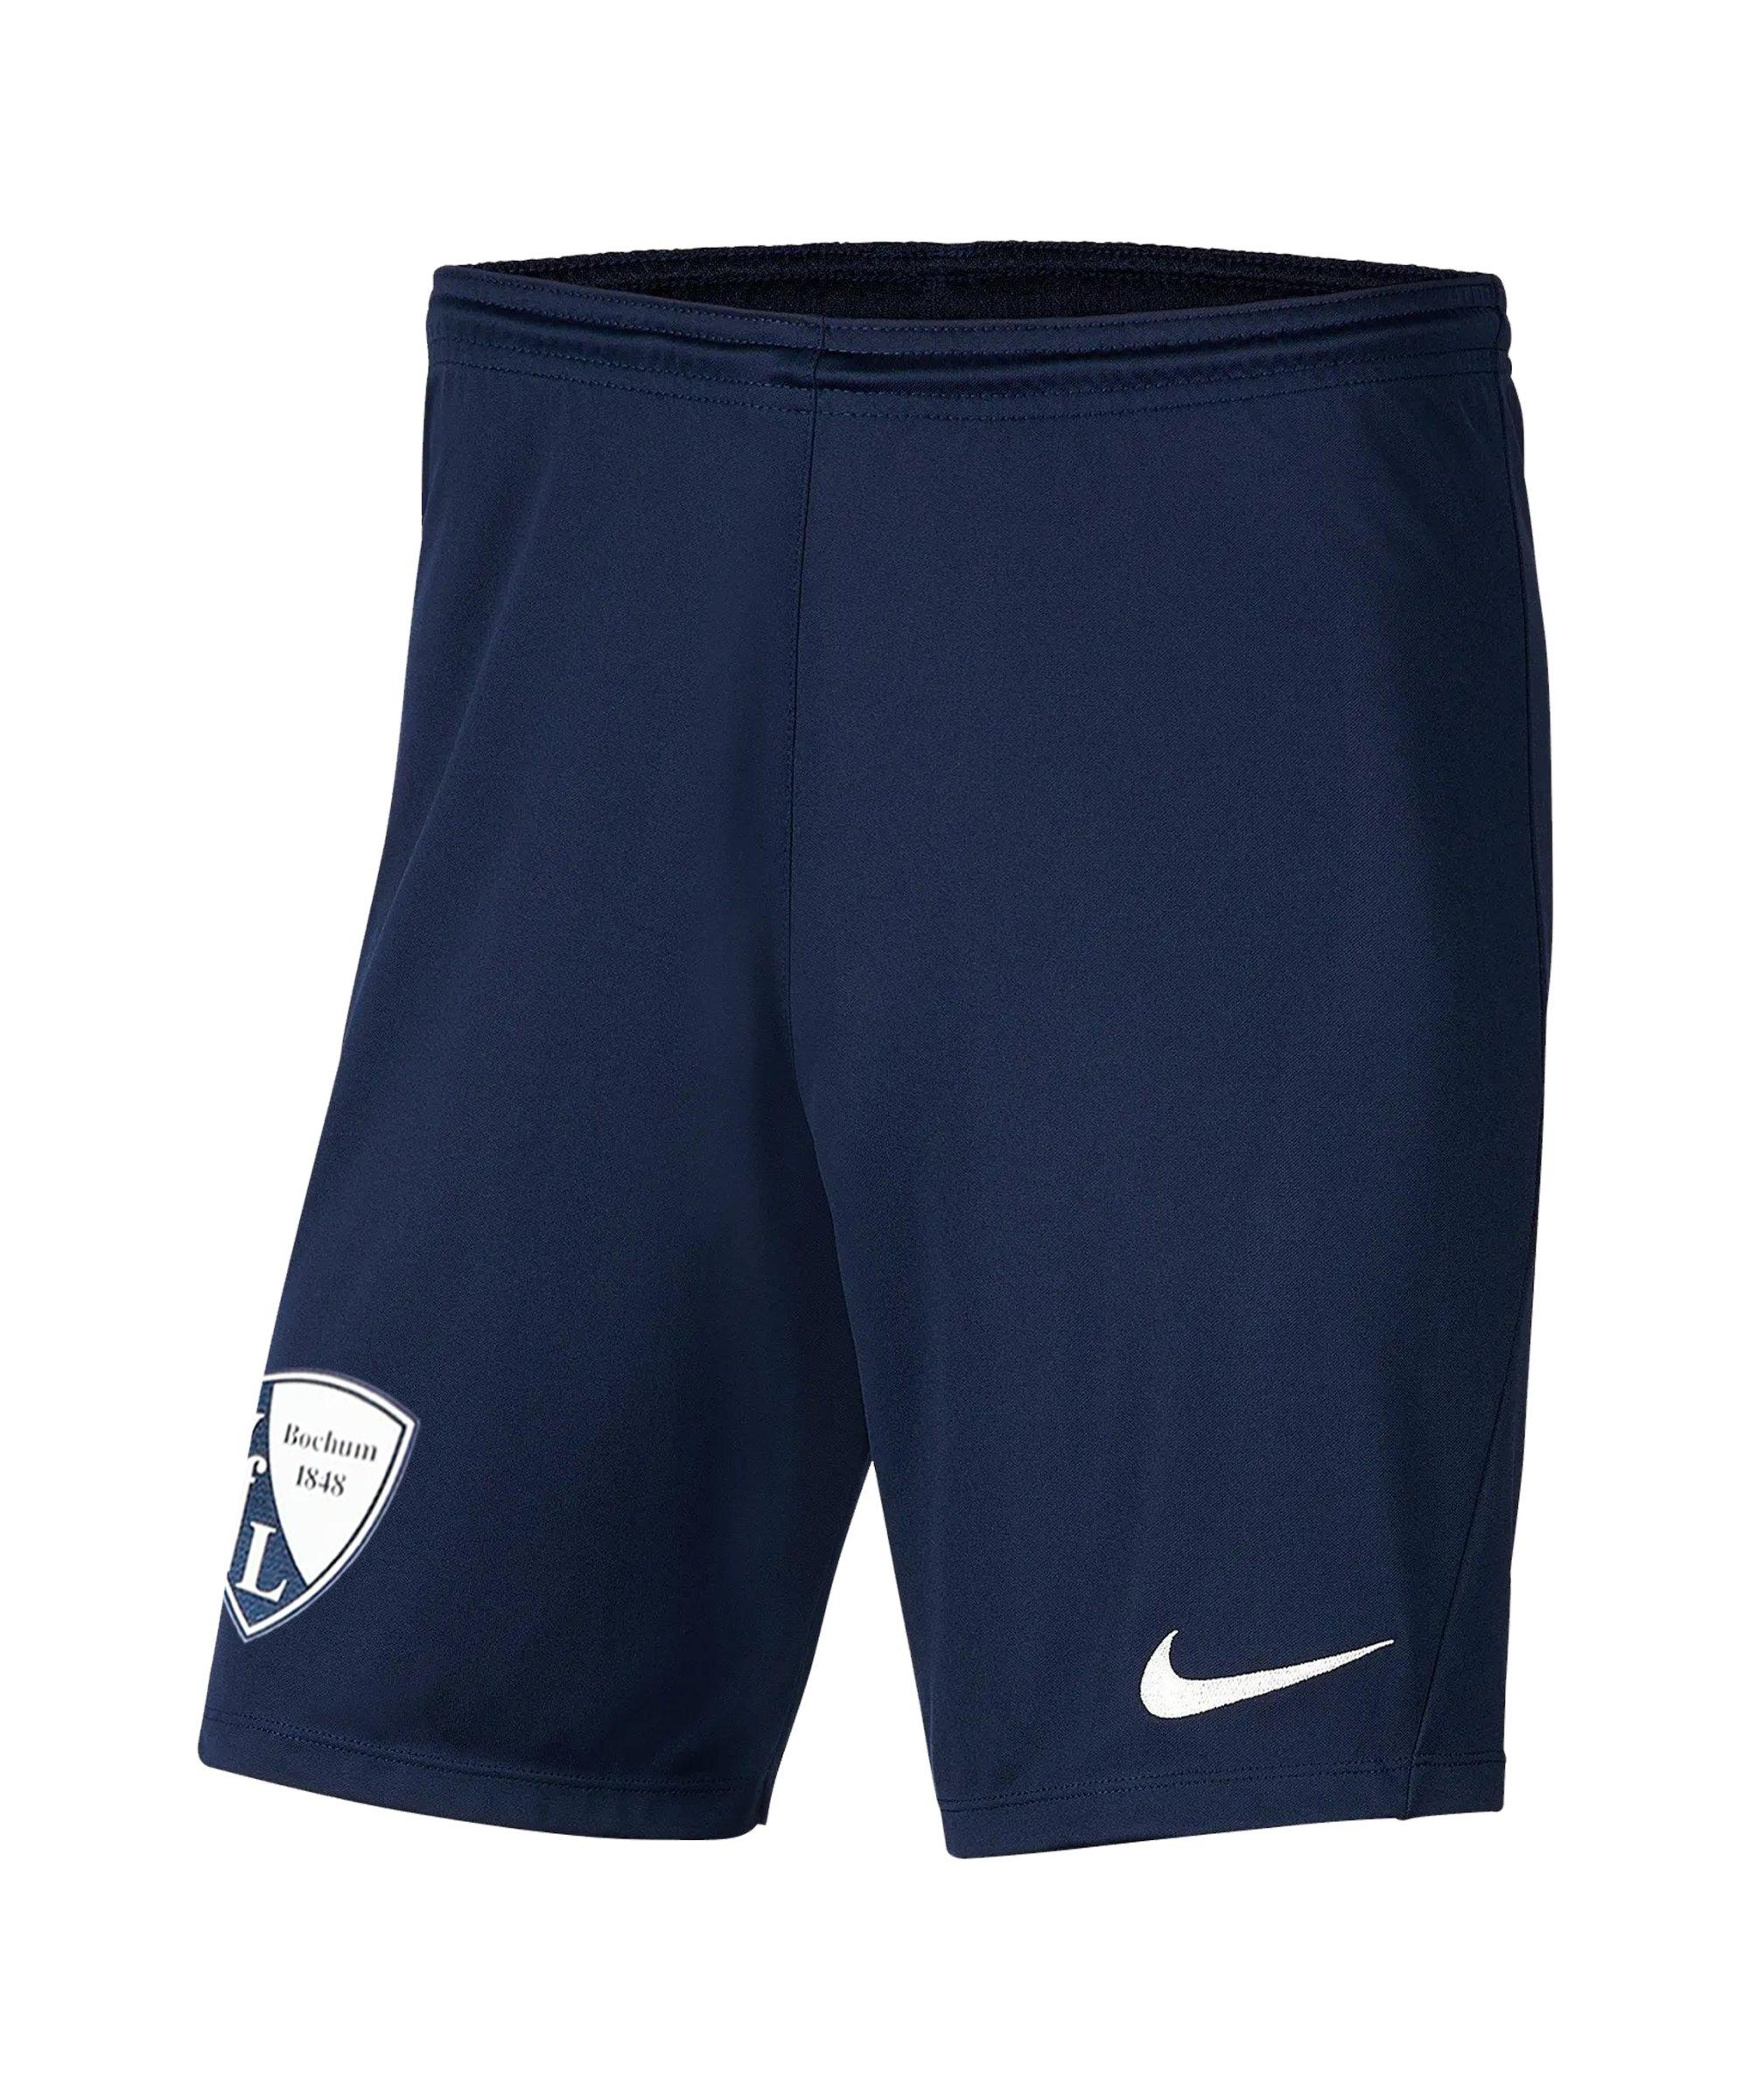 Nike VfL Bochum Short Home 2021/2022 Kids Blau F410 - blau